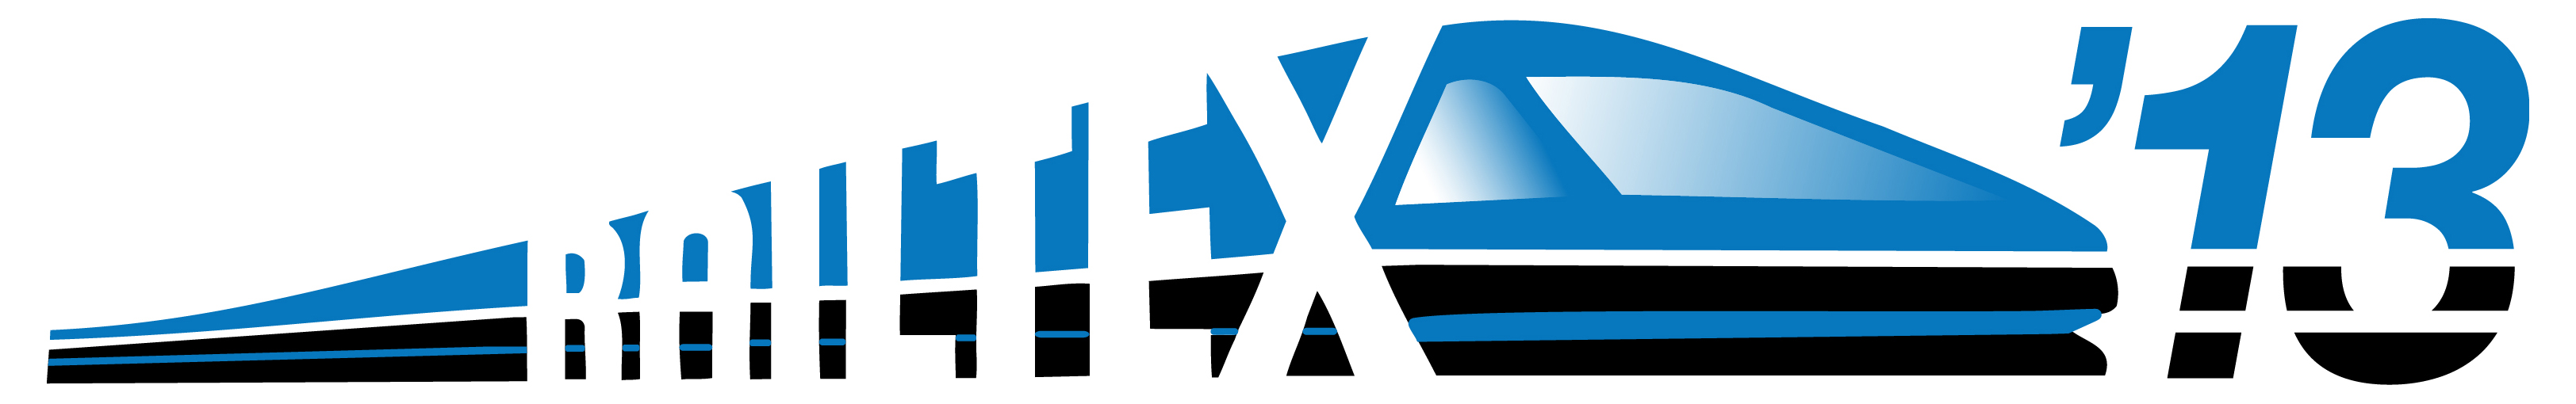 Railtex 2013